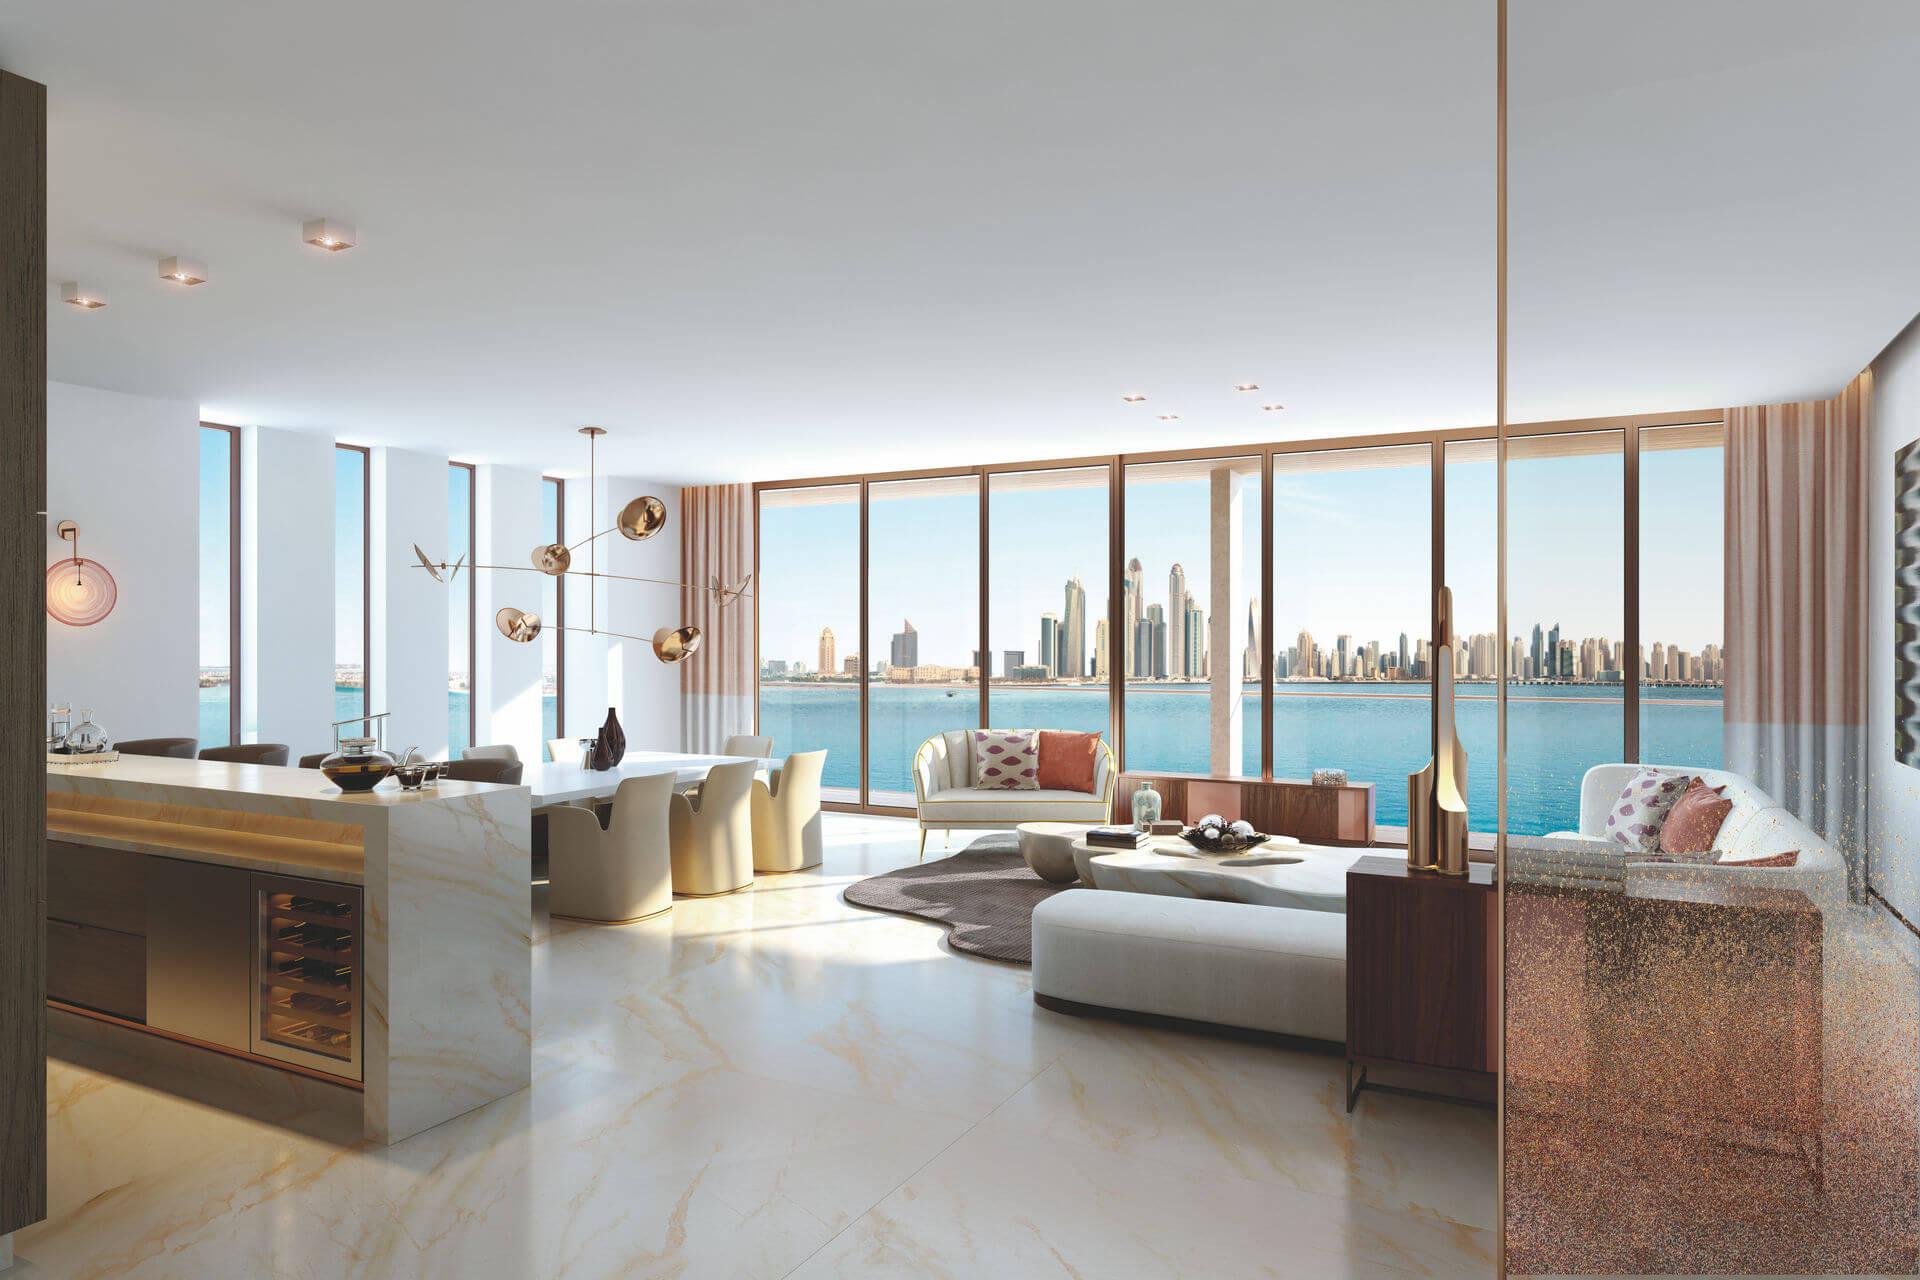 Penthouse for sale in Dubai, UAE, 5 bedrooms, 1531 m2, No. 23843 – photo 2